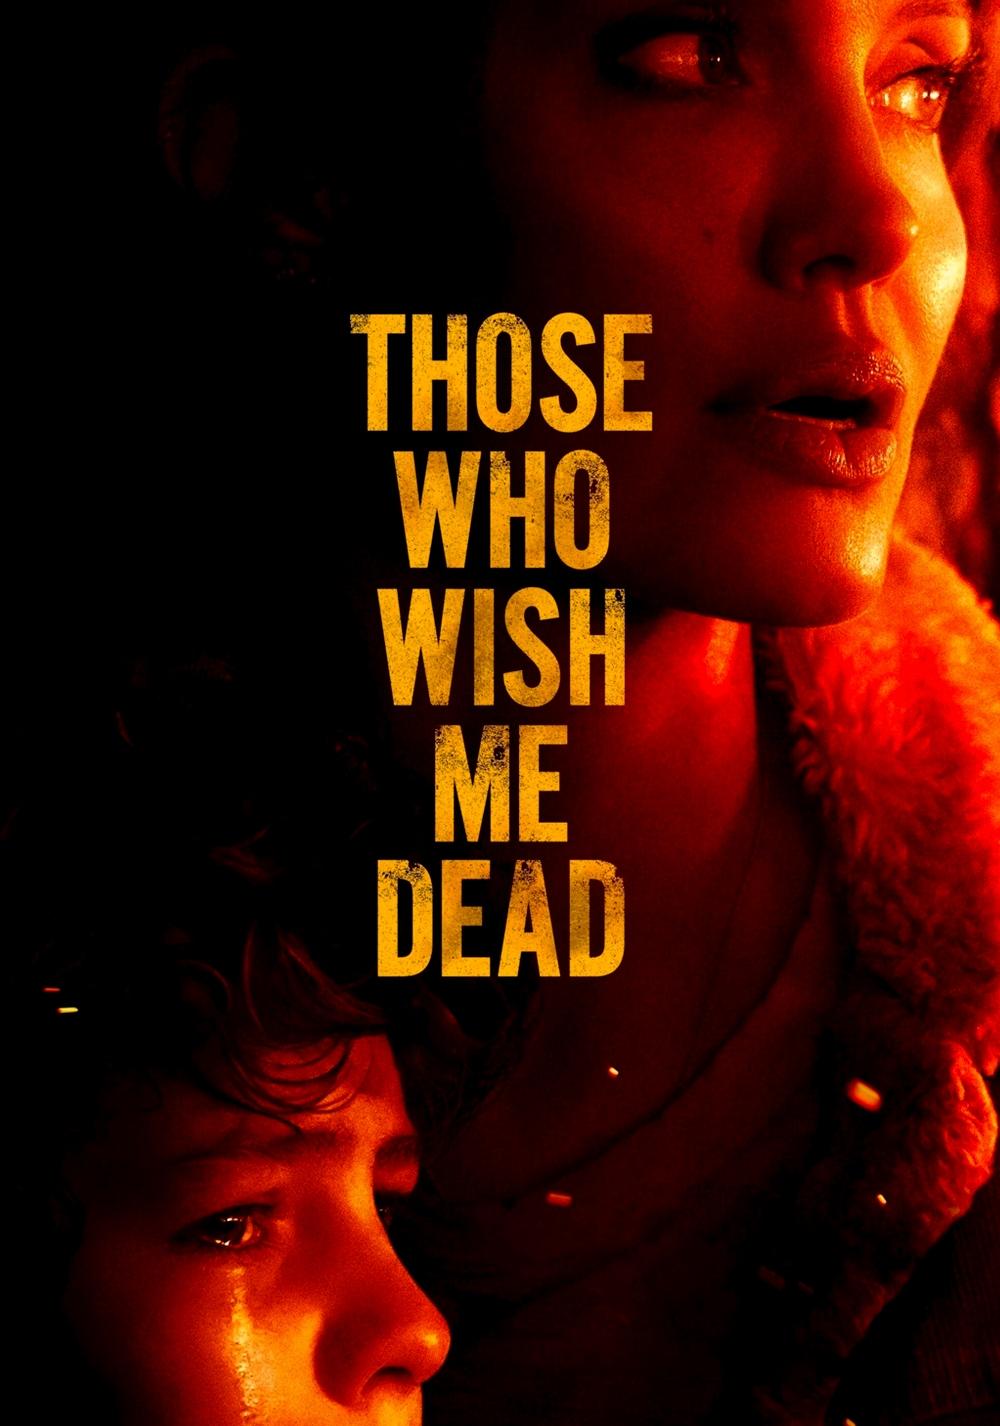 those-who-wish-me-dead-606ed6c1162d9